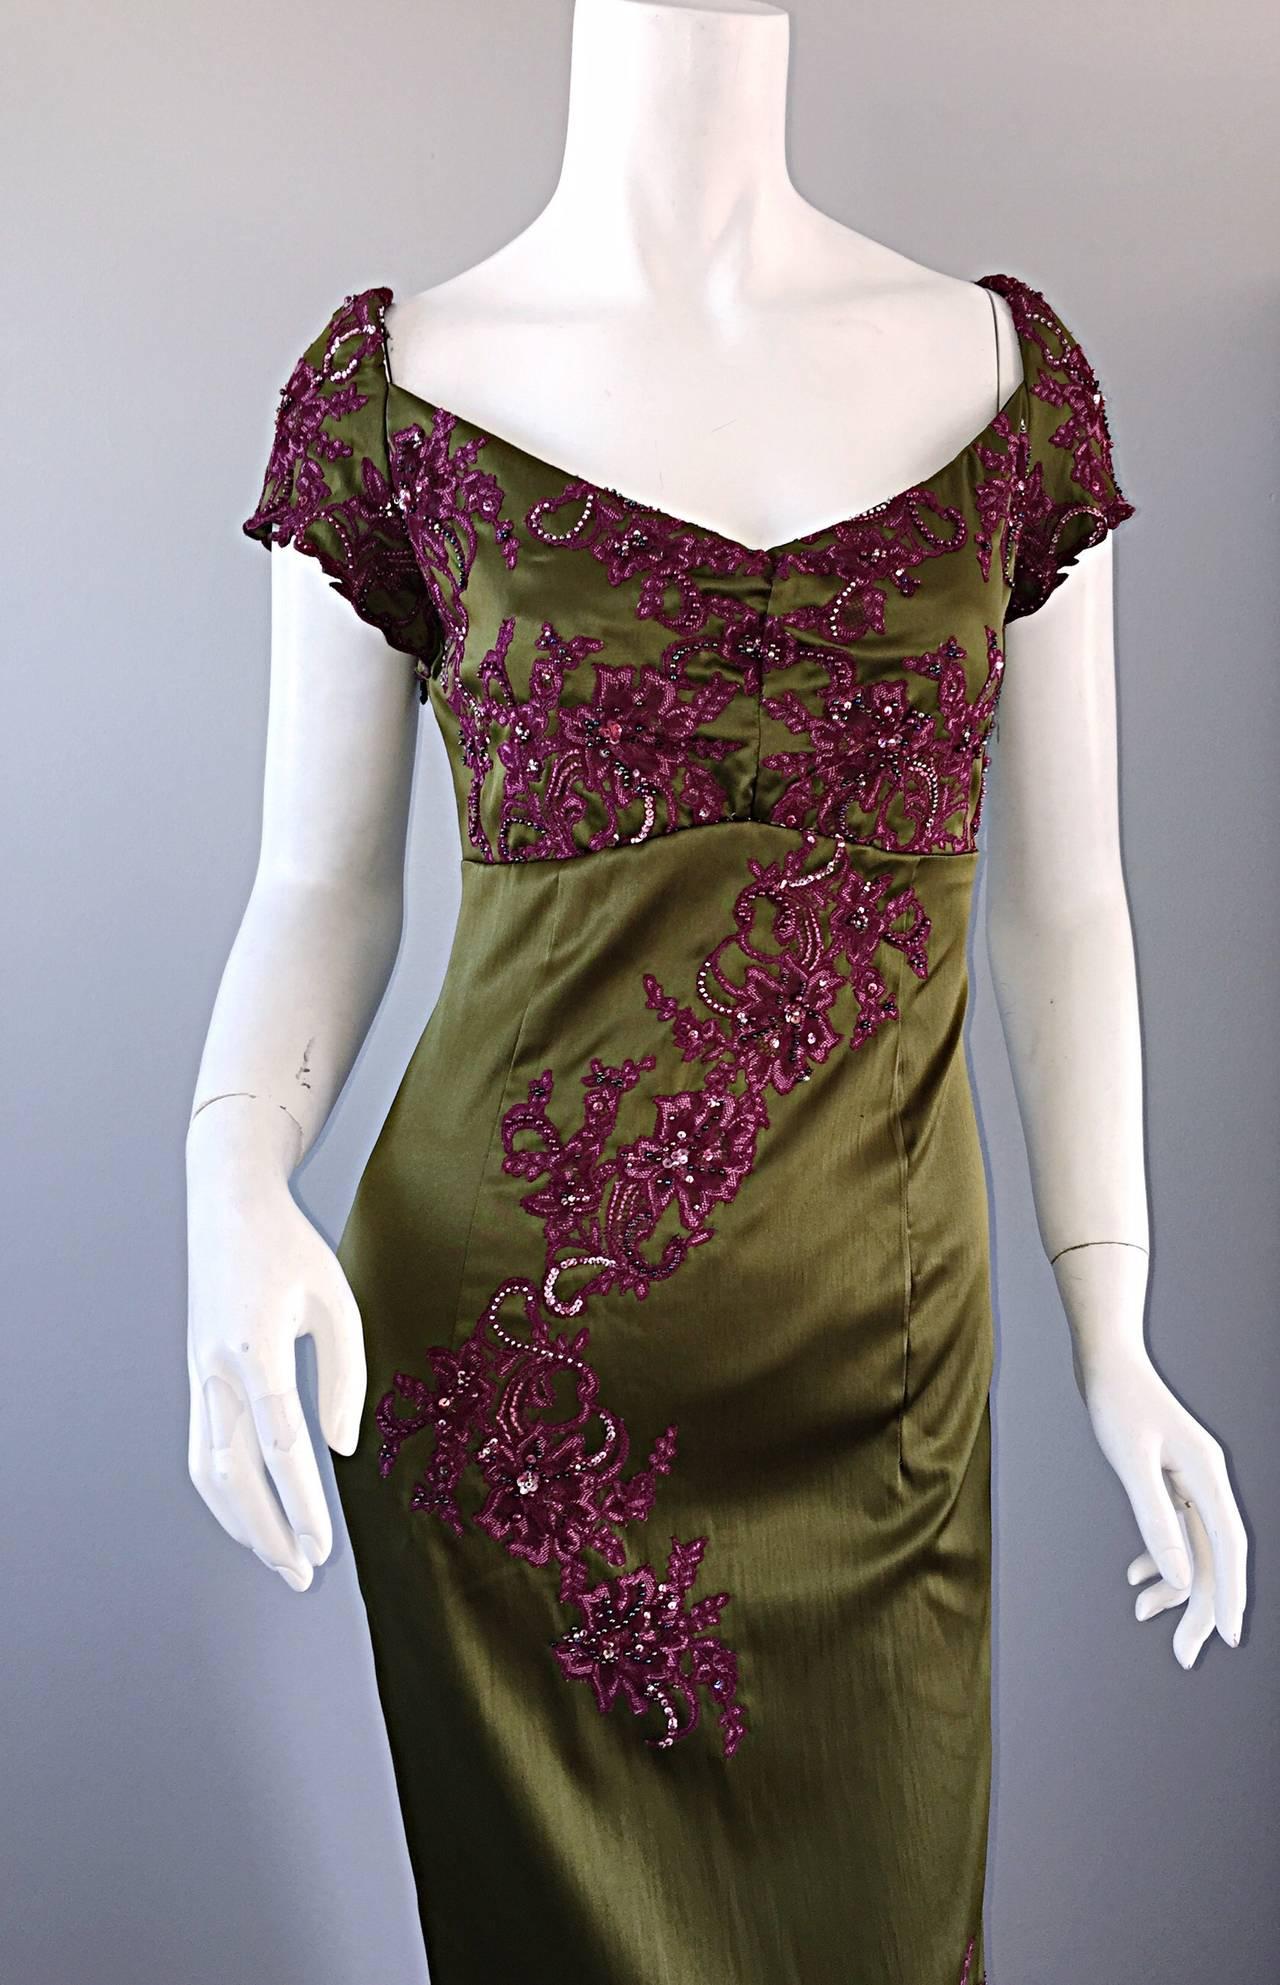 Beautiful Mandalay Chartreuse Merlot Sz 6 Silk Bombshell Dress w/ Beading & Lace For Sale 2